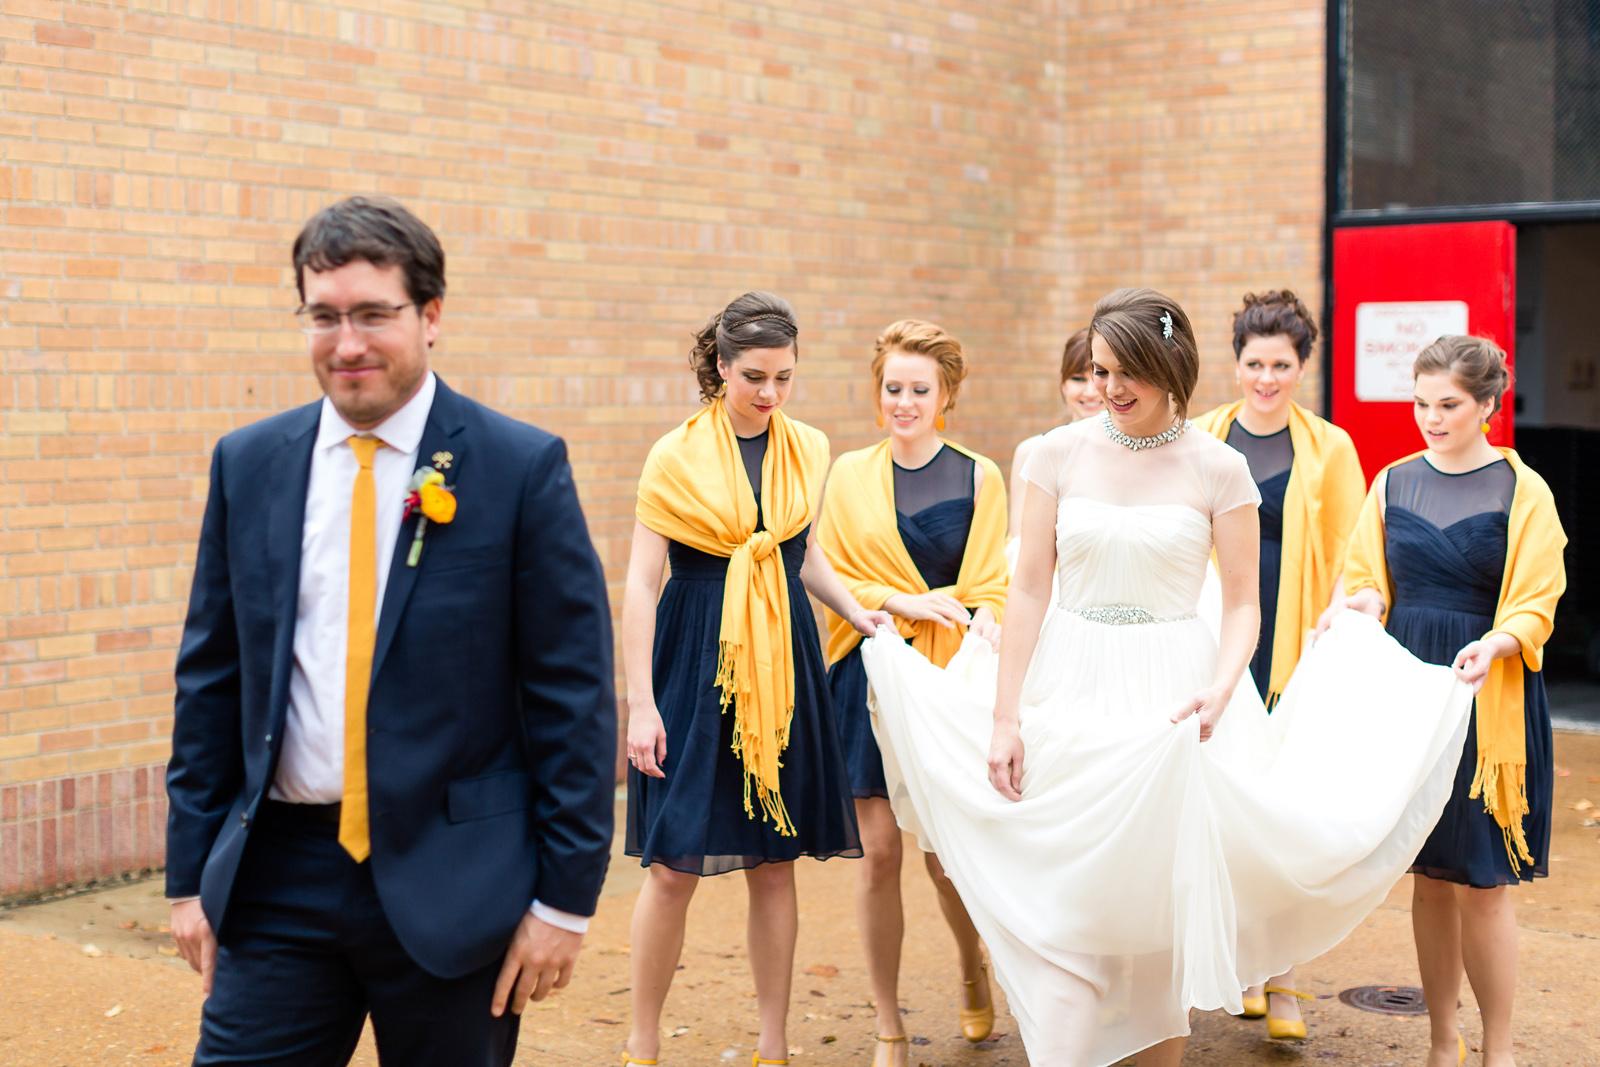 Oldani Photography-St Louis-Wedding Photos-wedding photographer-First Look-Mad Art Gallery_20141122_14354698.jpg